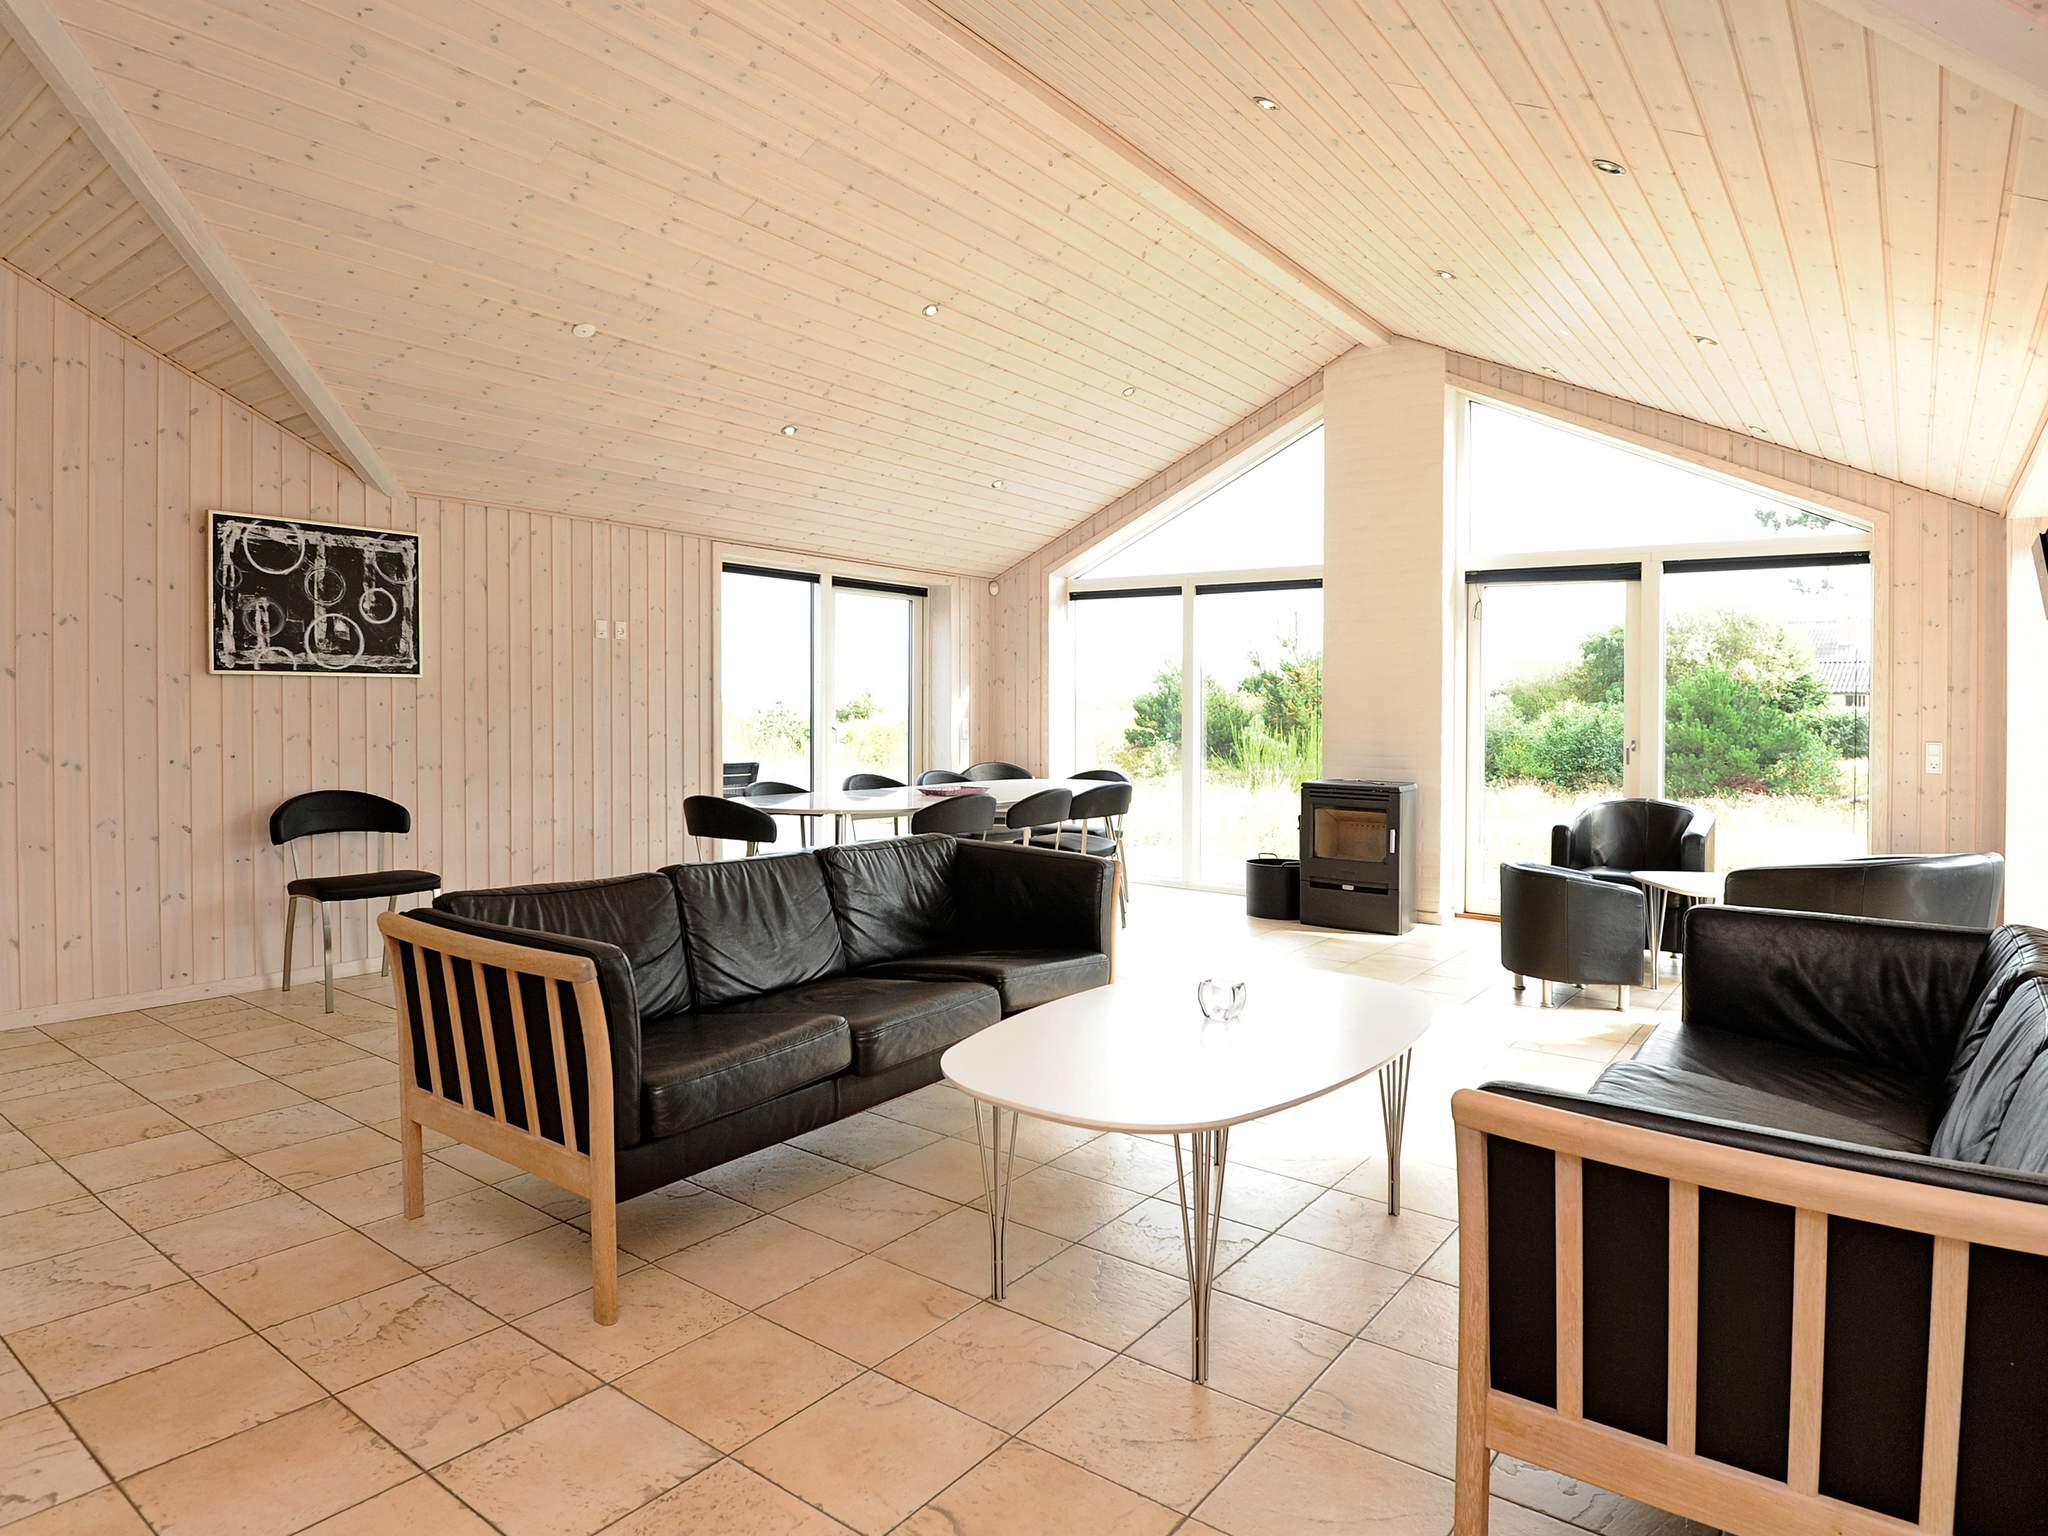 Ferienhaus Rømø/Havneby (437893), Rømø, , Südwestjütland, Dänemark, Bild 2